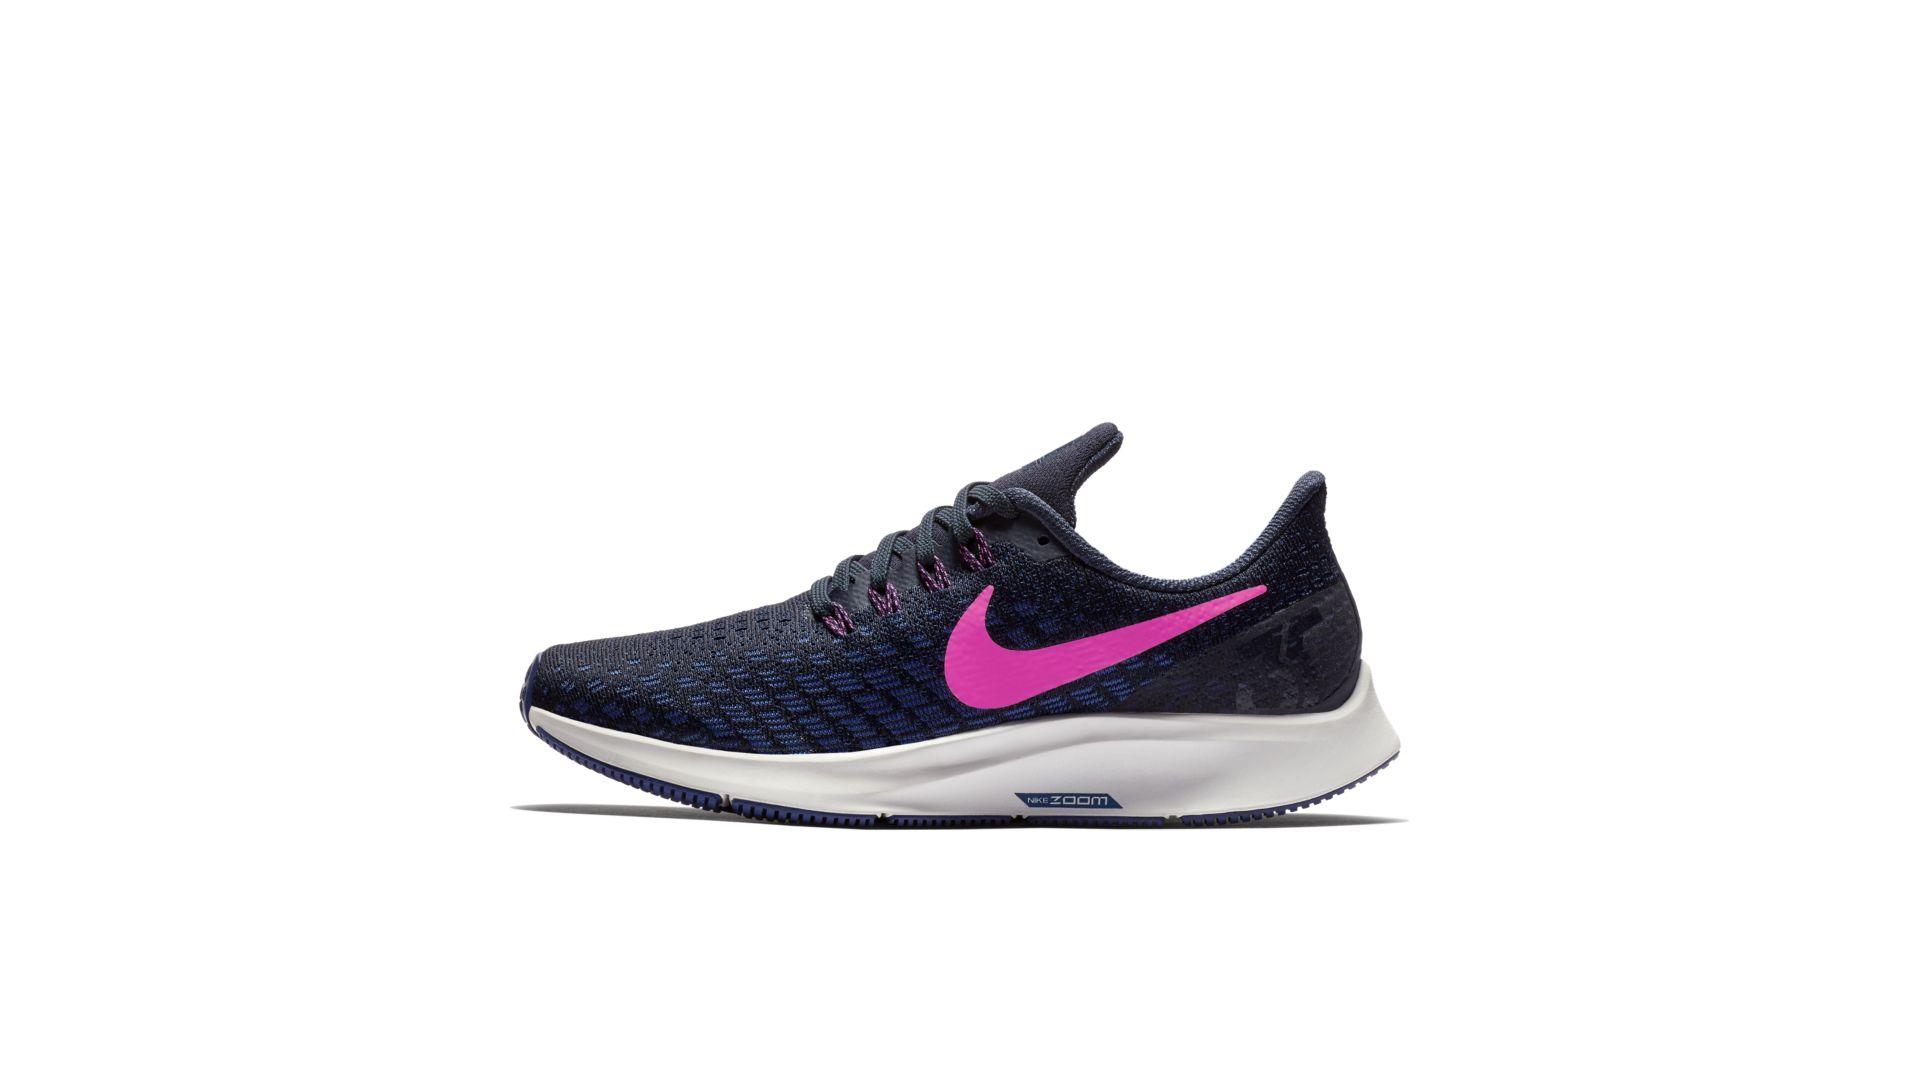 Nike Air Zoom Pegasus 35 Obsidian/Deep Royal Blue/Summit White/Pink Blast (942855-401)